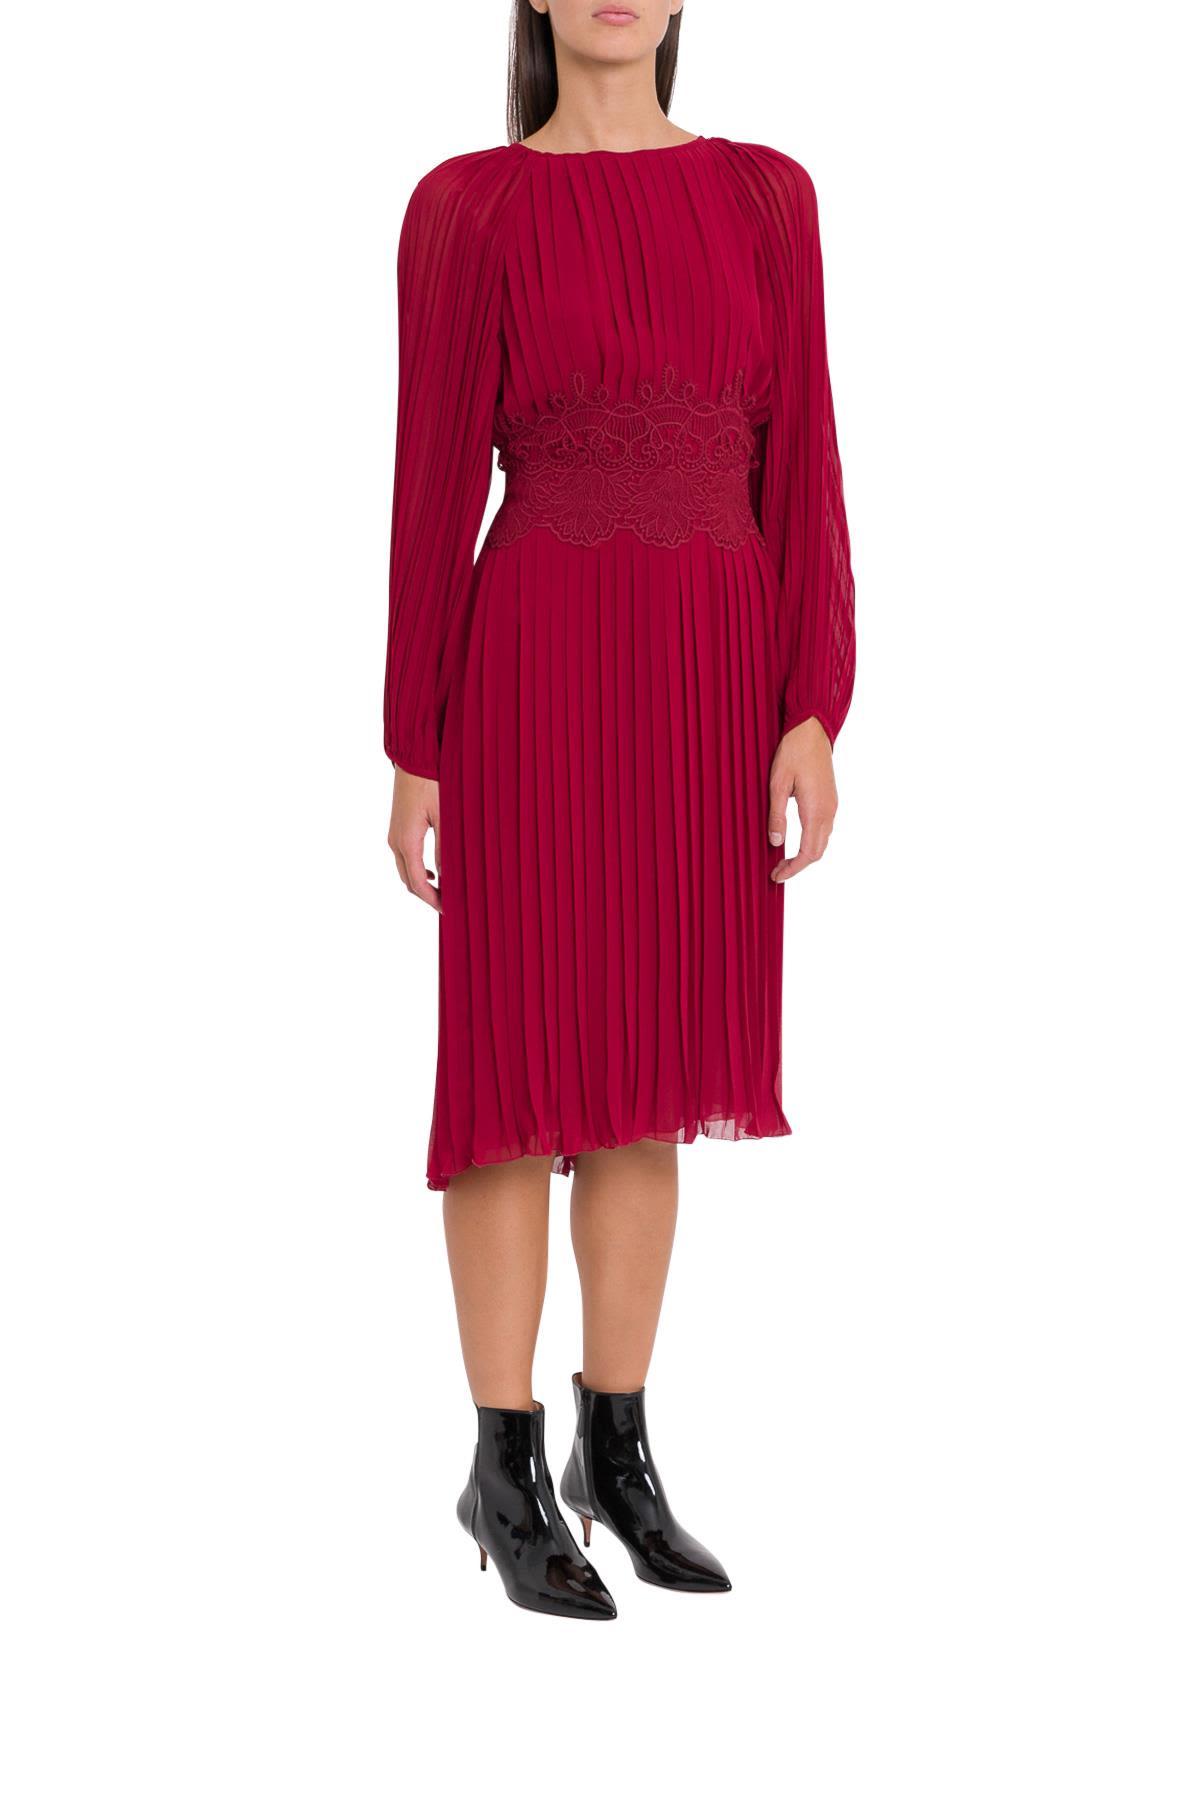 Parosh Pleated Dress 10712308